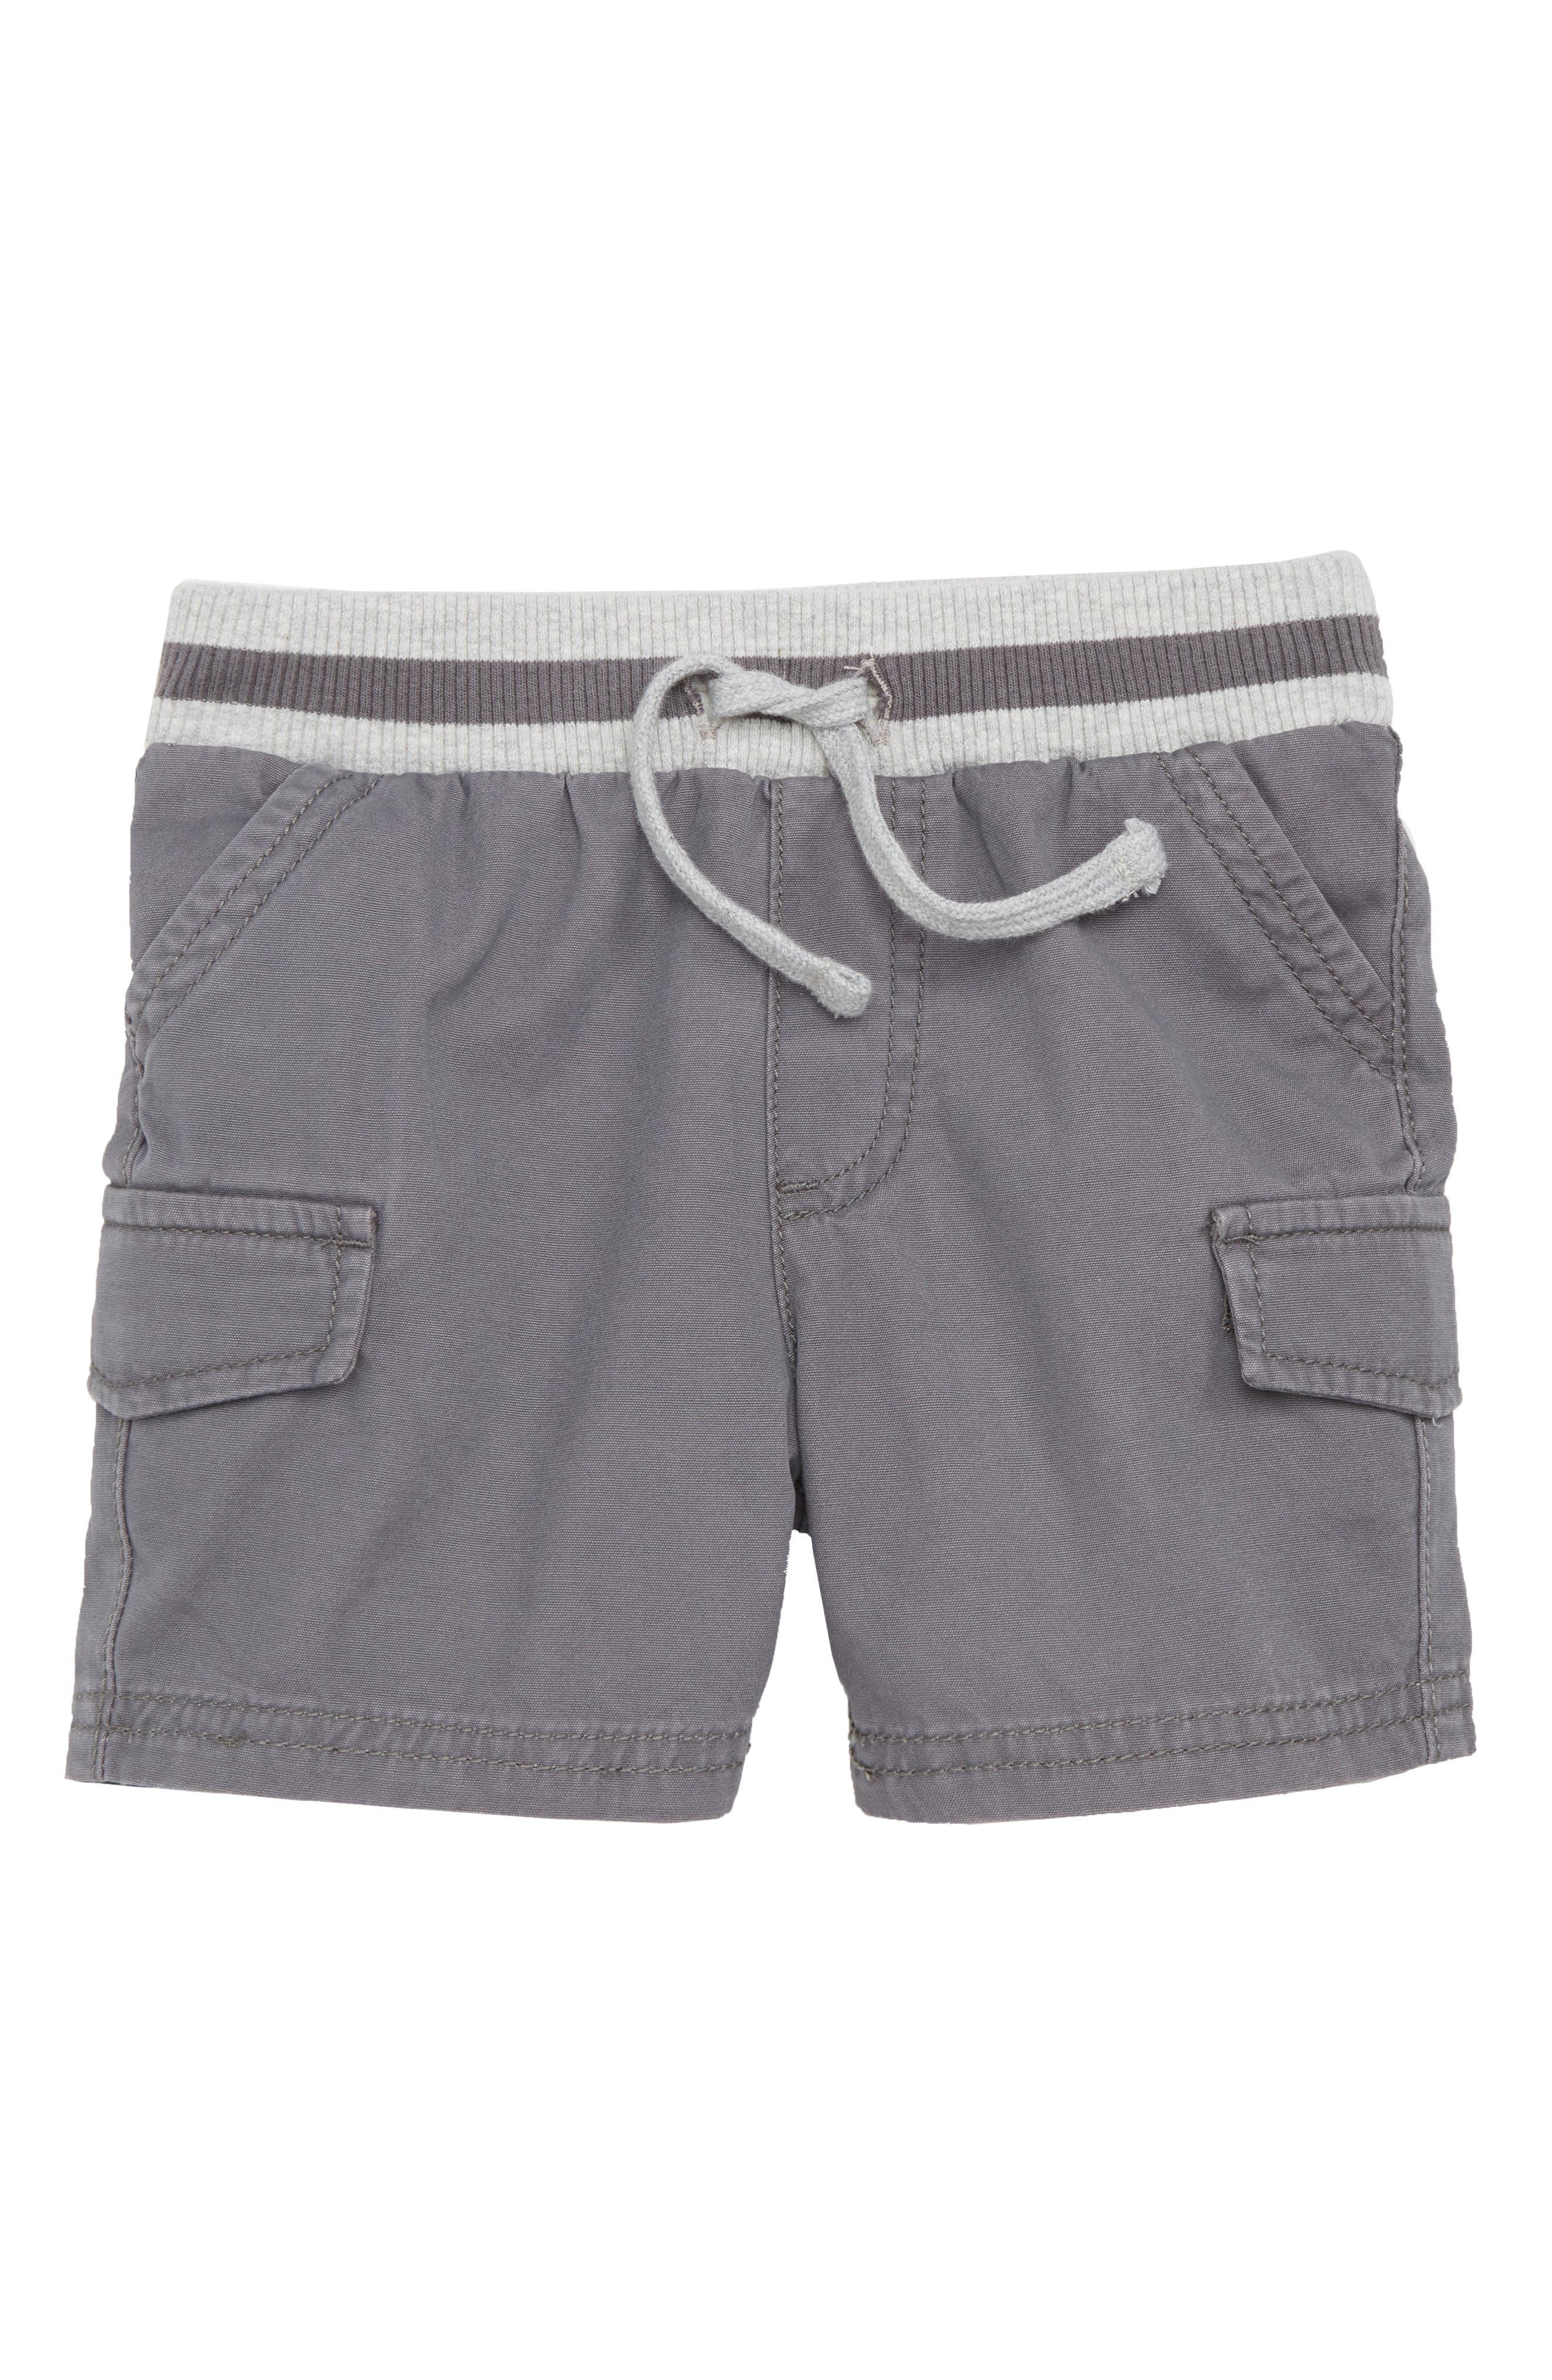 Cargo Shorts,                         Main,                         color, 021